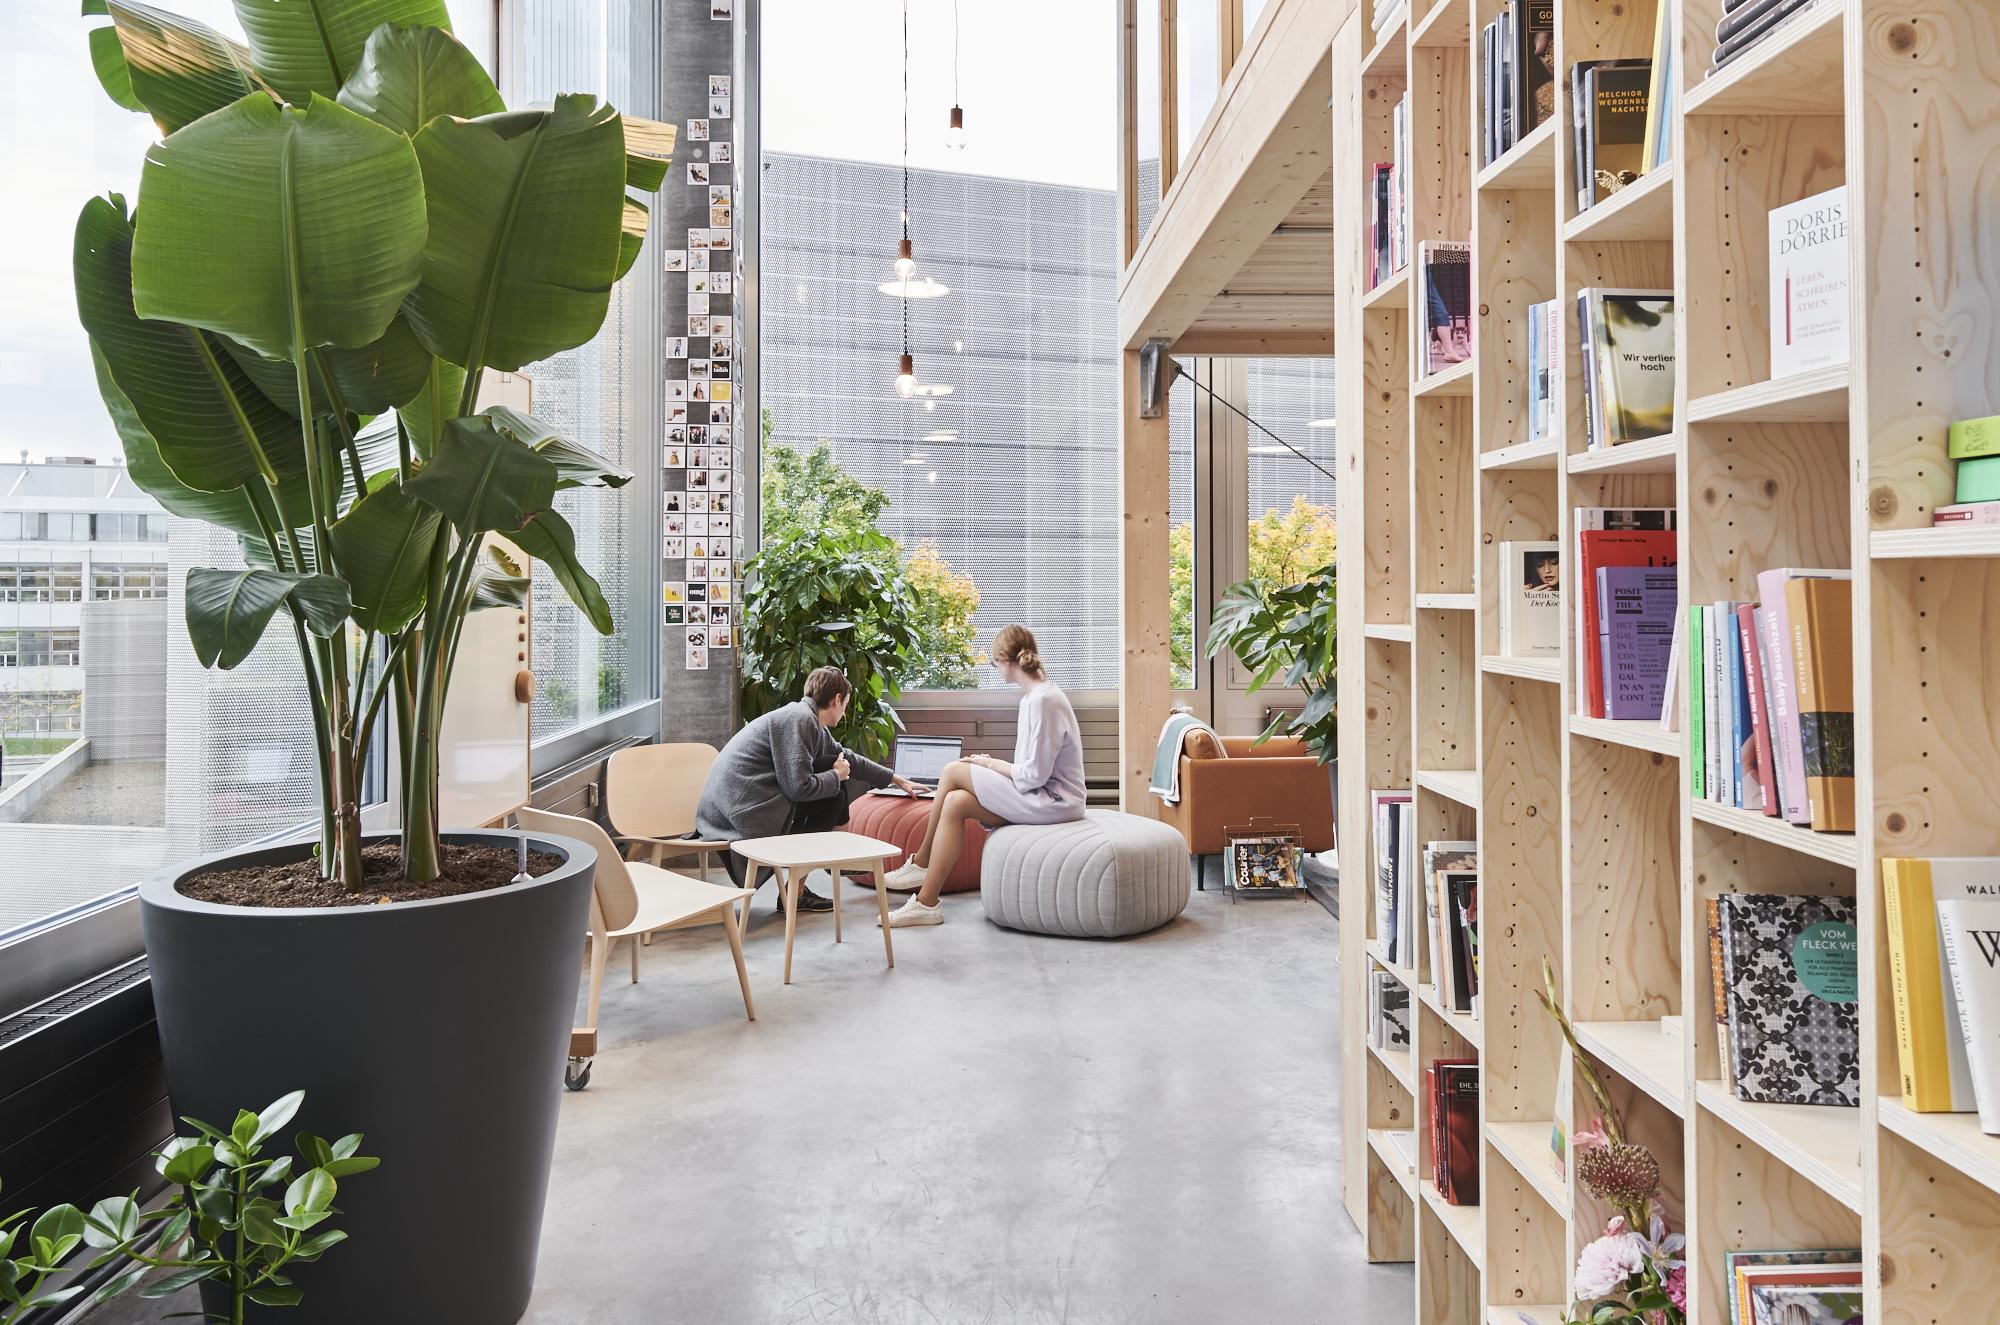 Tadah Coworking Space